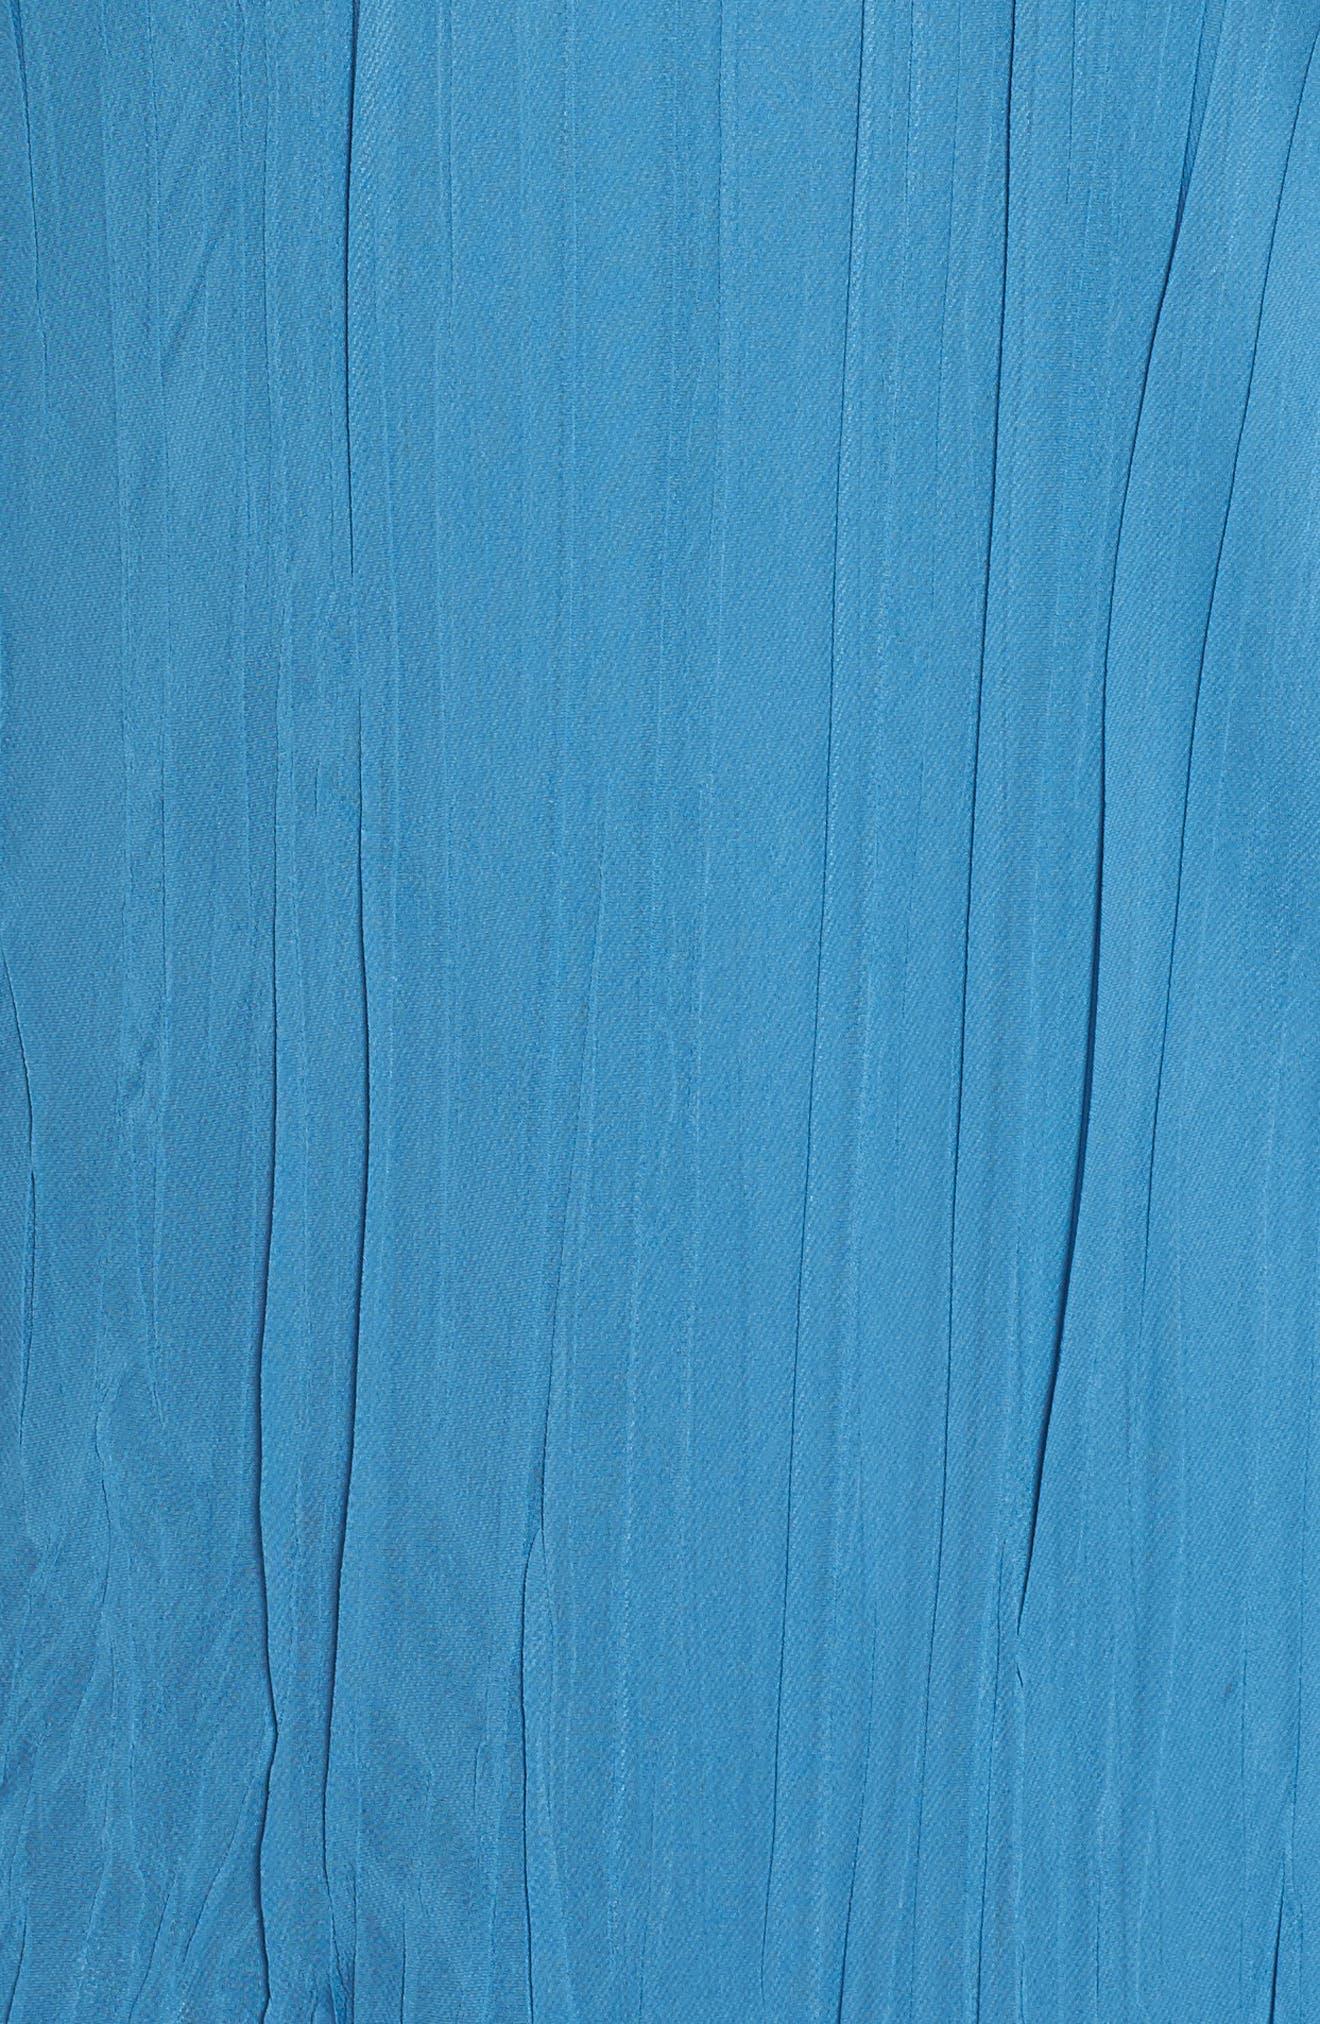 Dress Tiered Chiffon & Charmeuse Dress,                             Alternate thumbnail 5, color,                             Blue Dusk Night Ombre